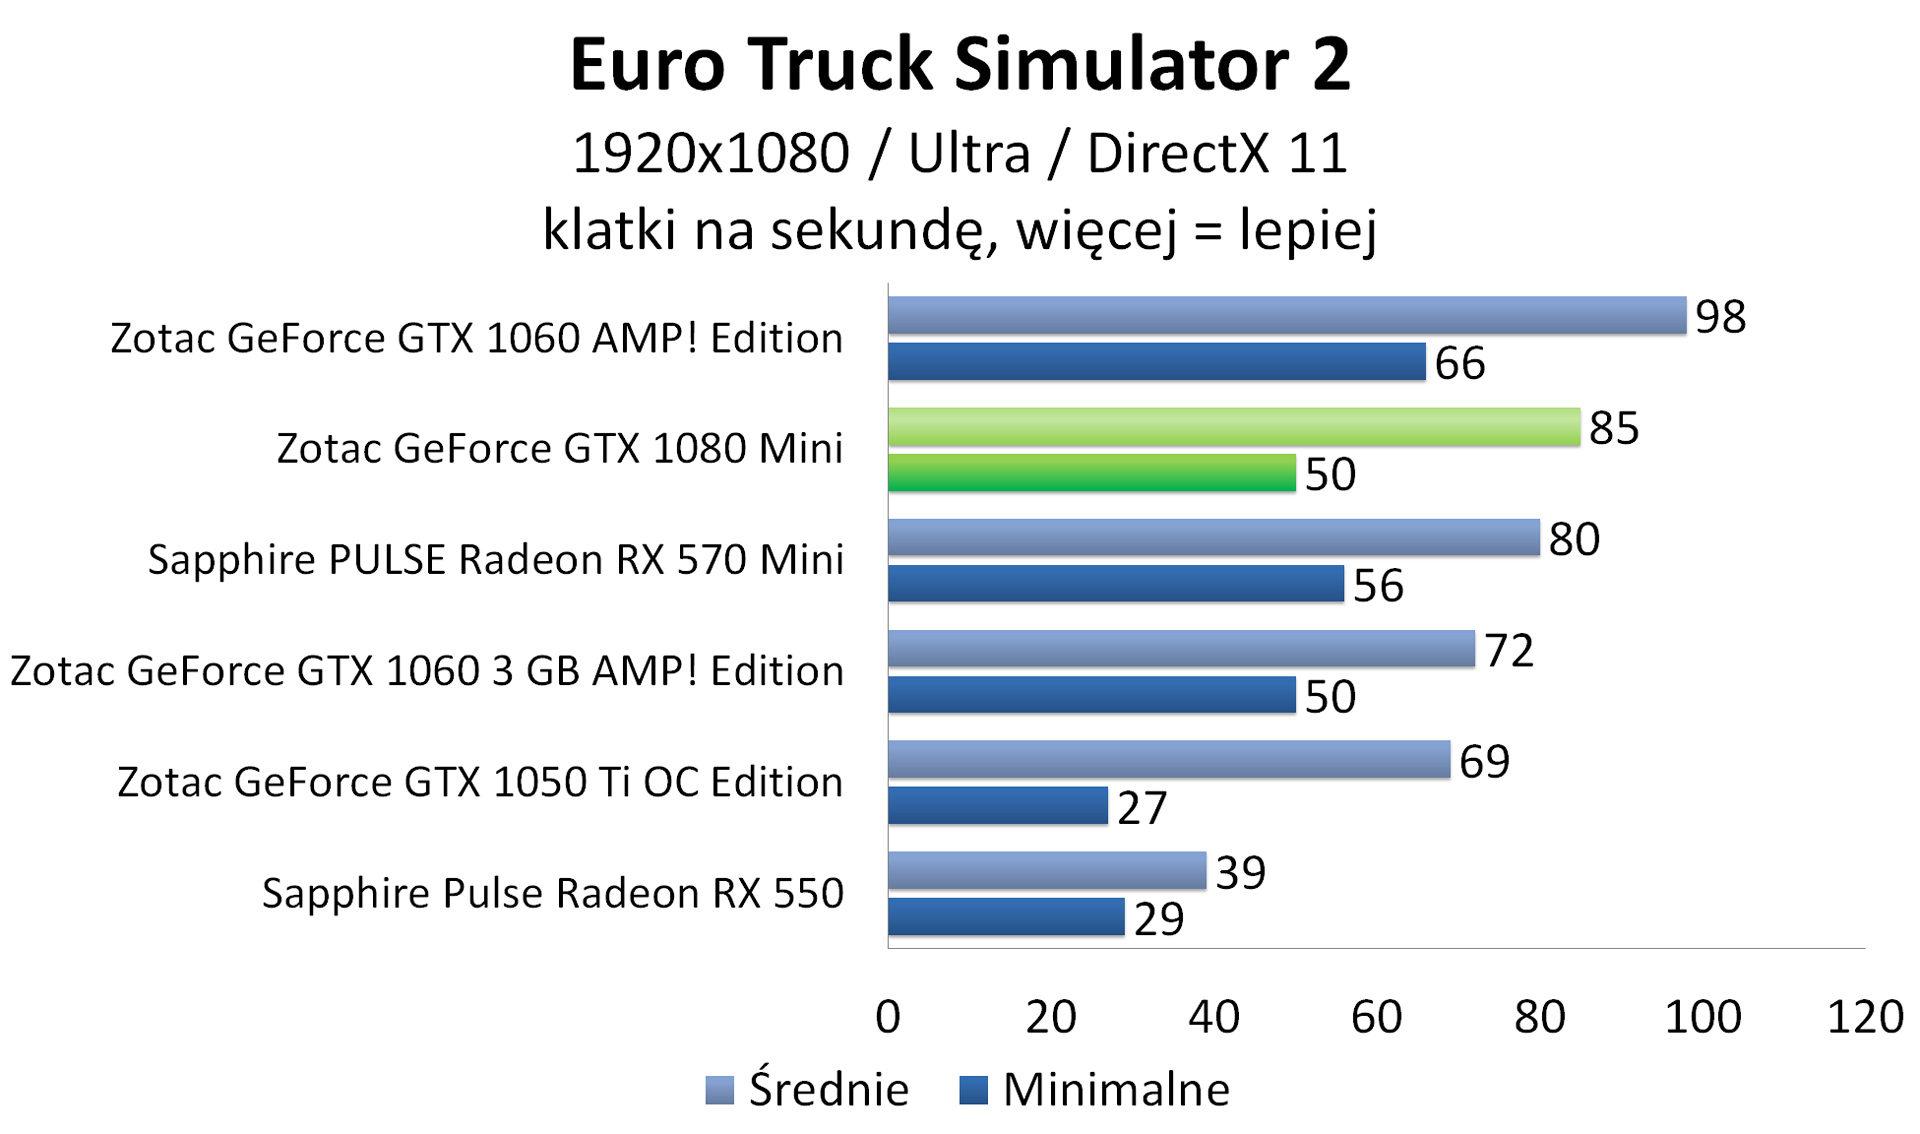 Zotac GeForce GTX 1080 Mini - Euro Truck Simulator 2